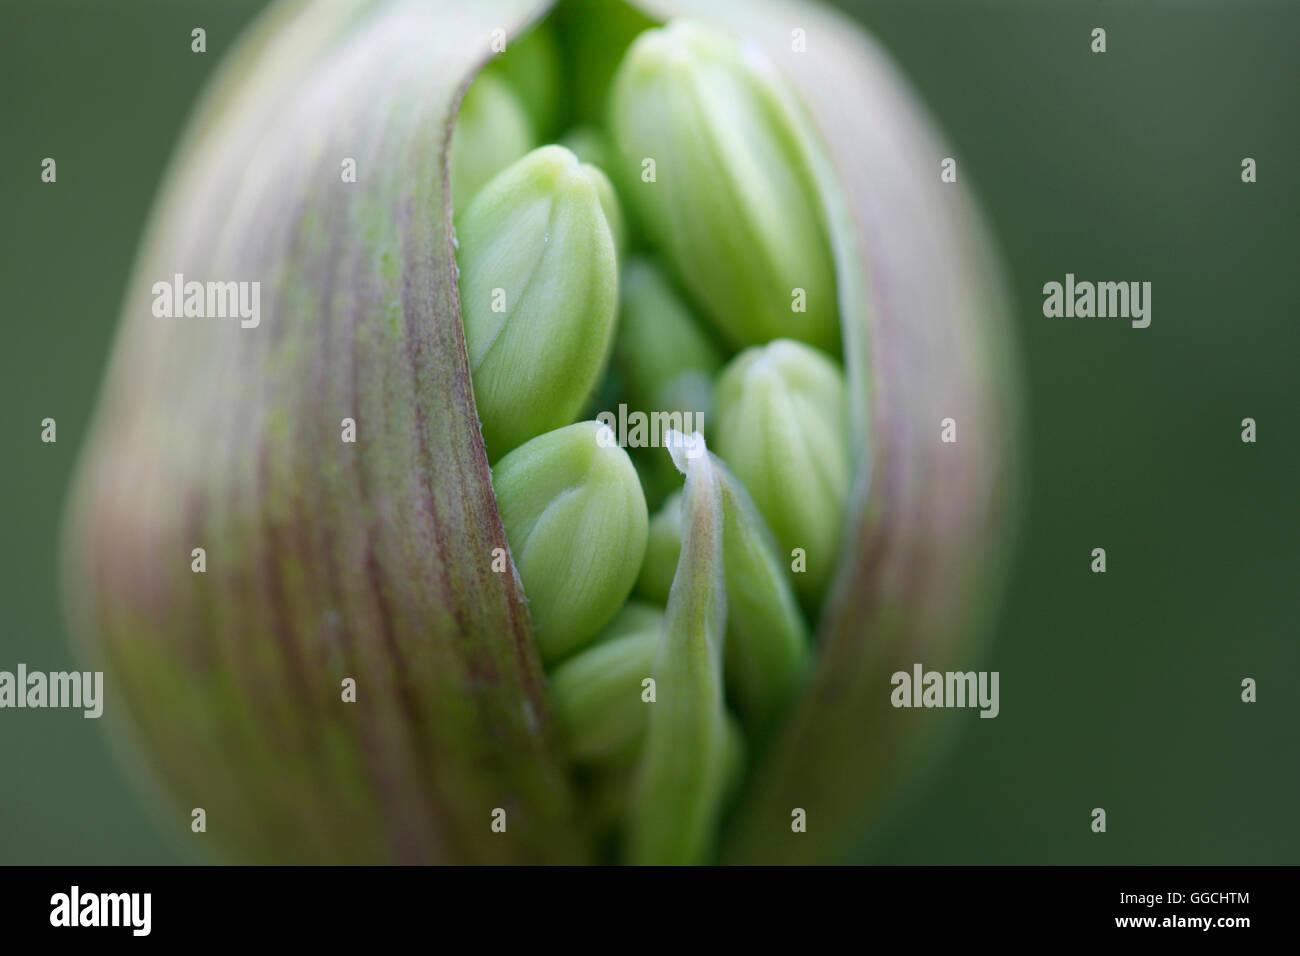 Agapanthus seed pod bursting with nature's energy Jane Ann Butler Photography JABP1536 - Stock Image